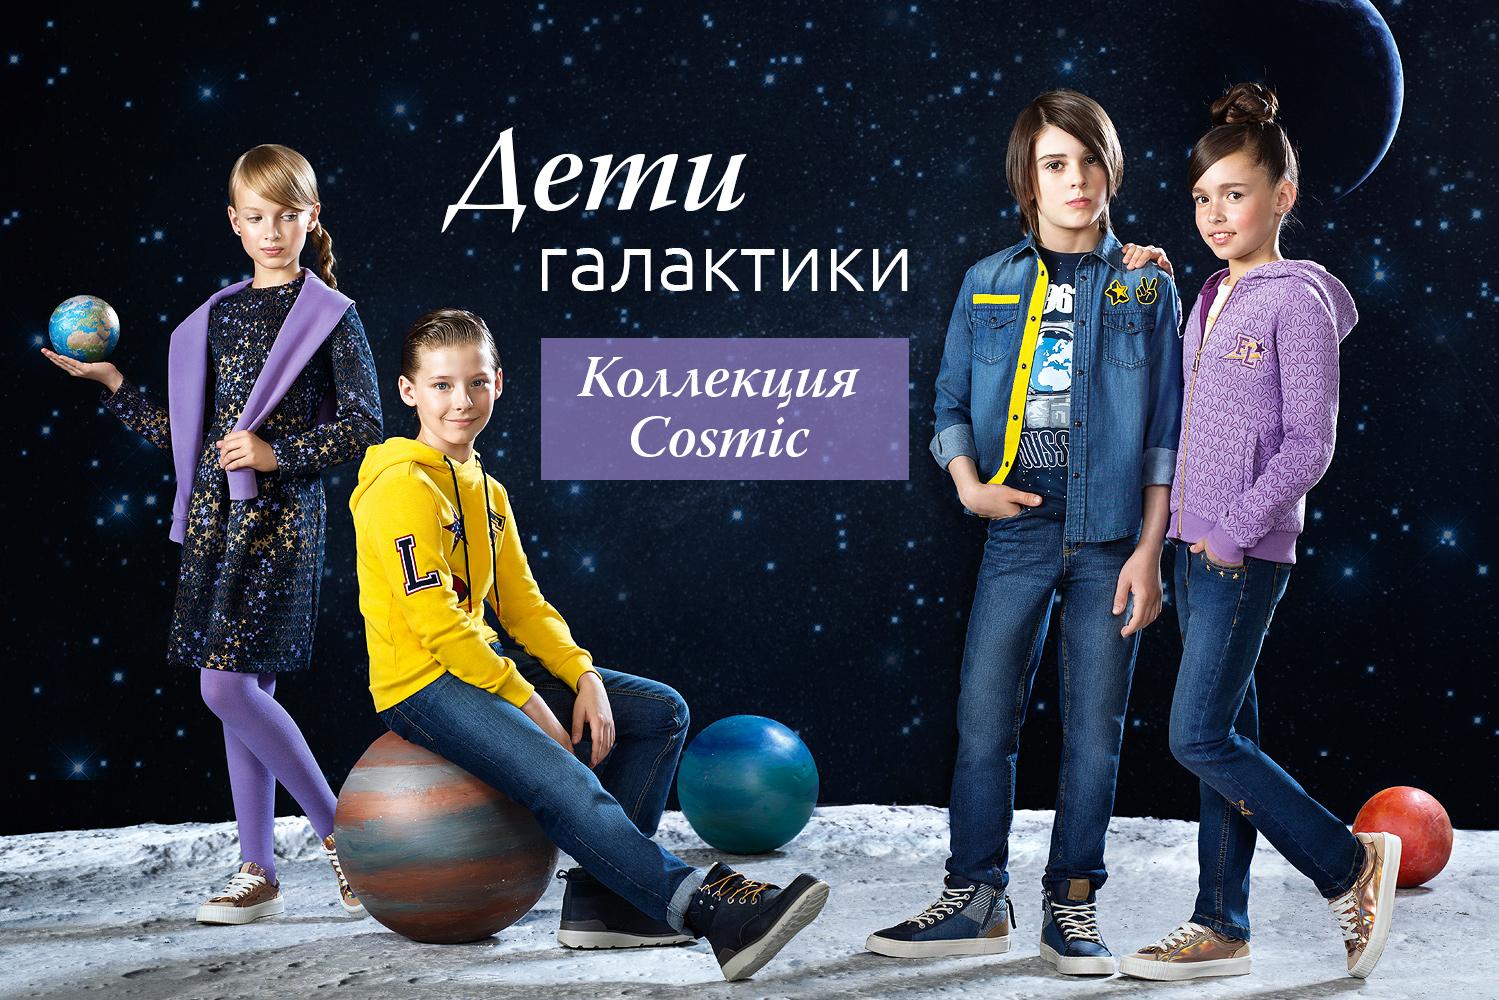 Дети галактики! Новинки каталога №13